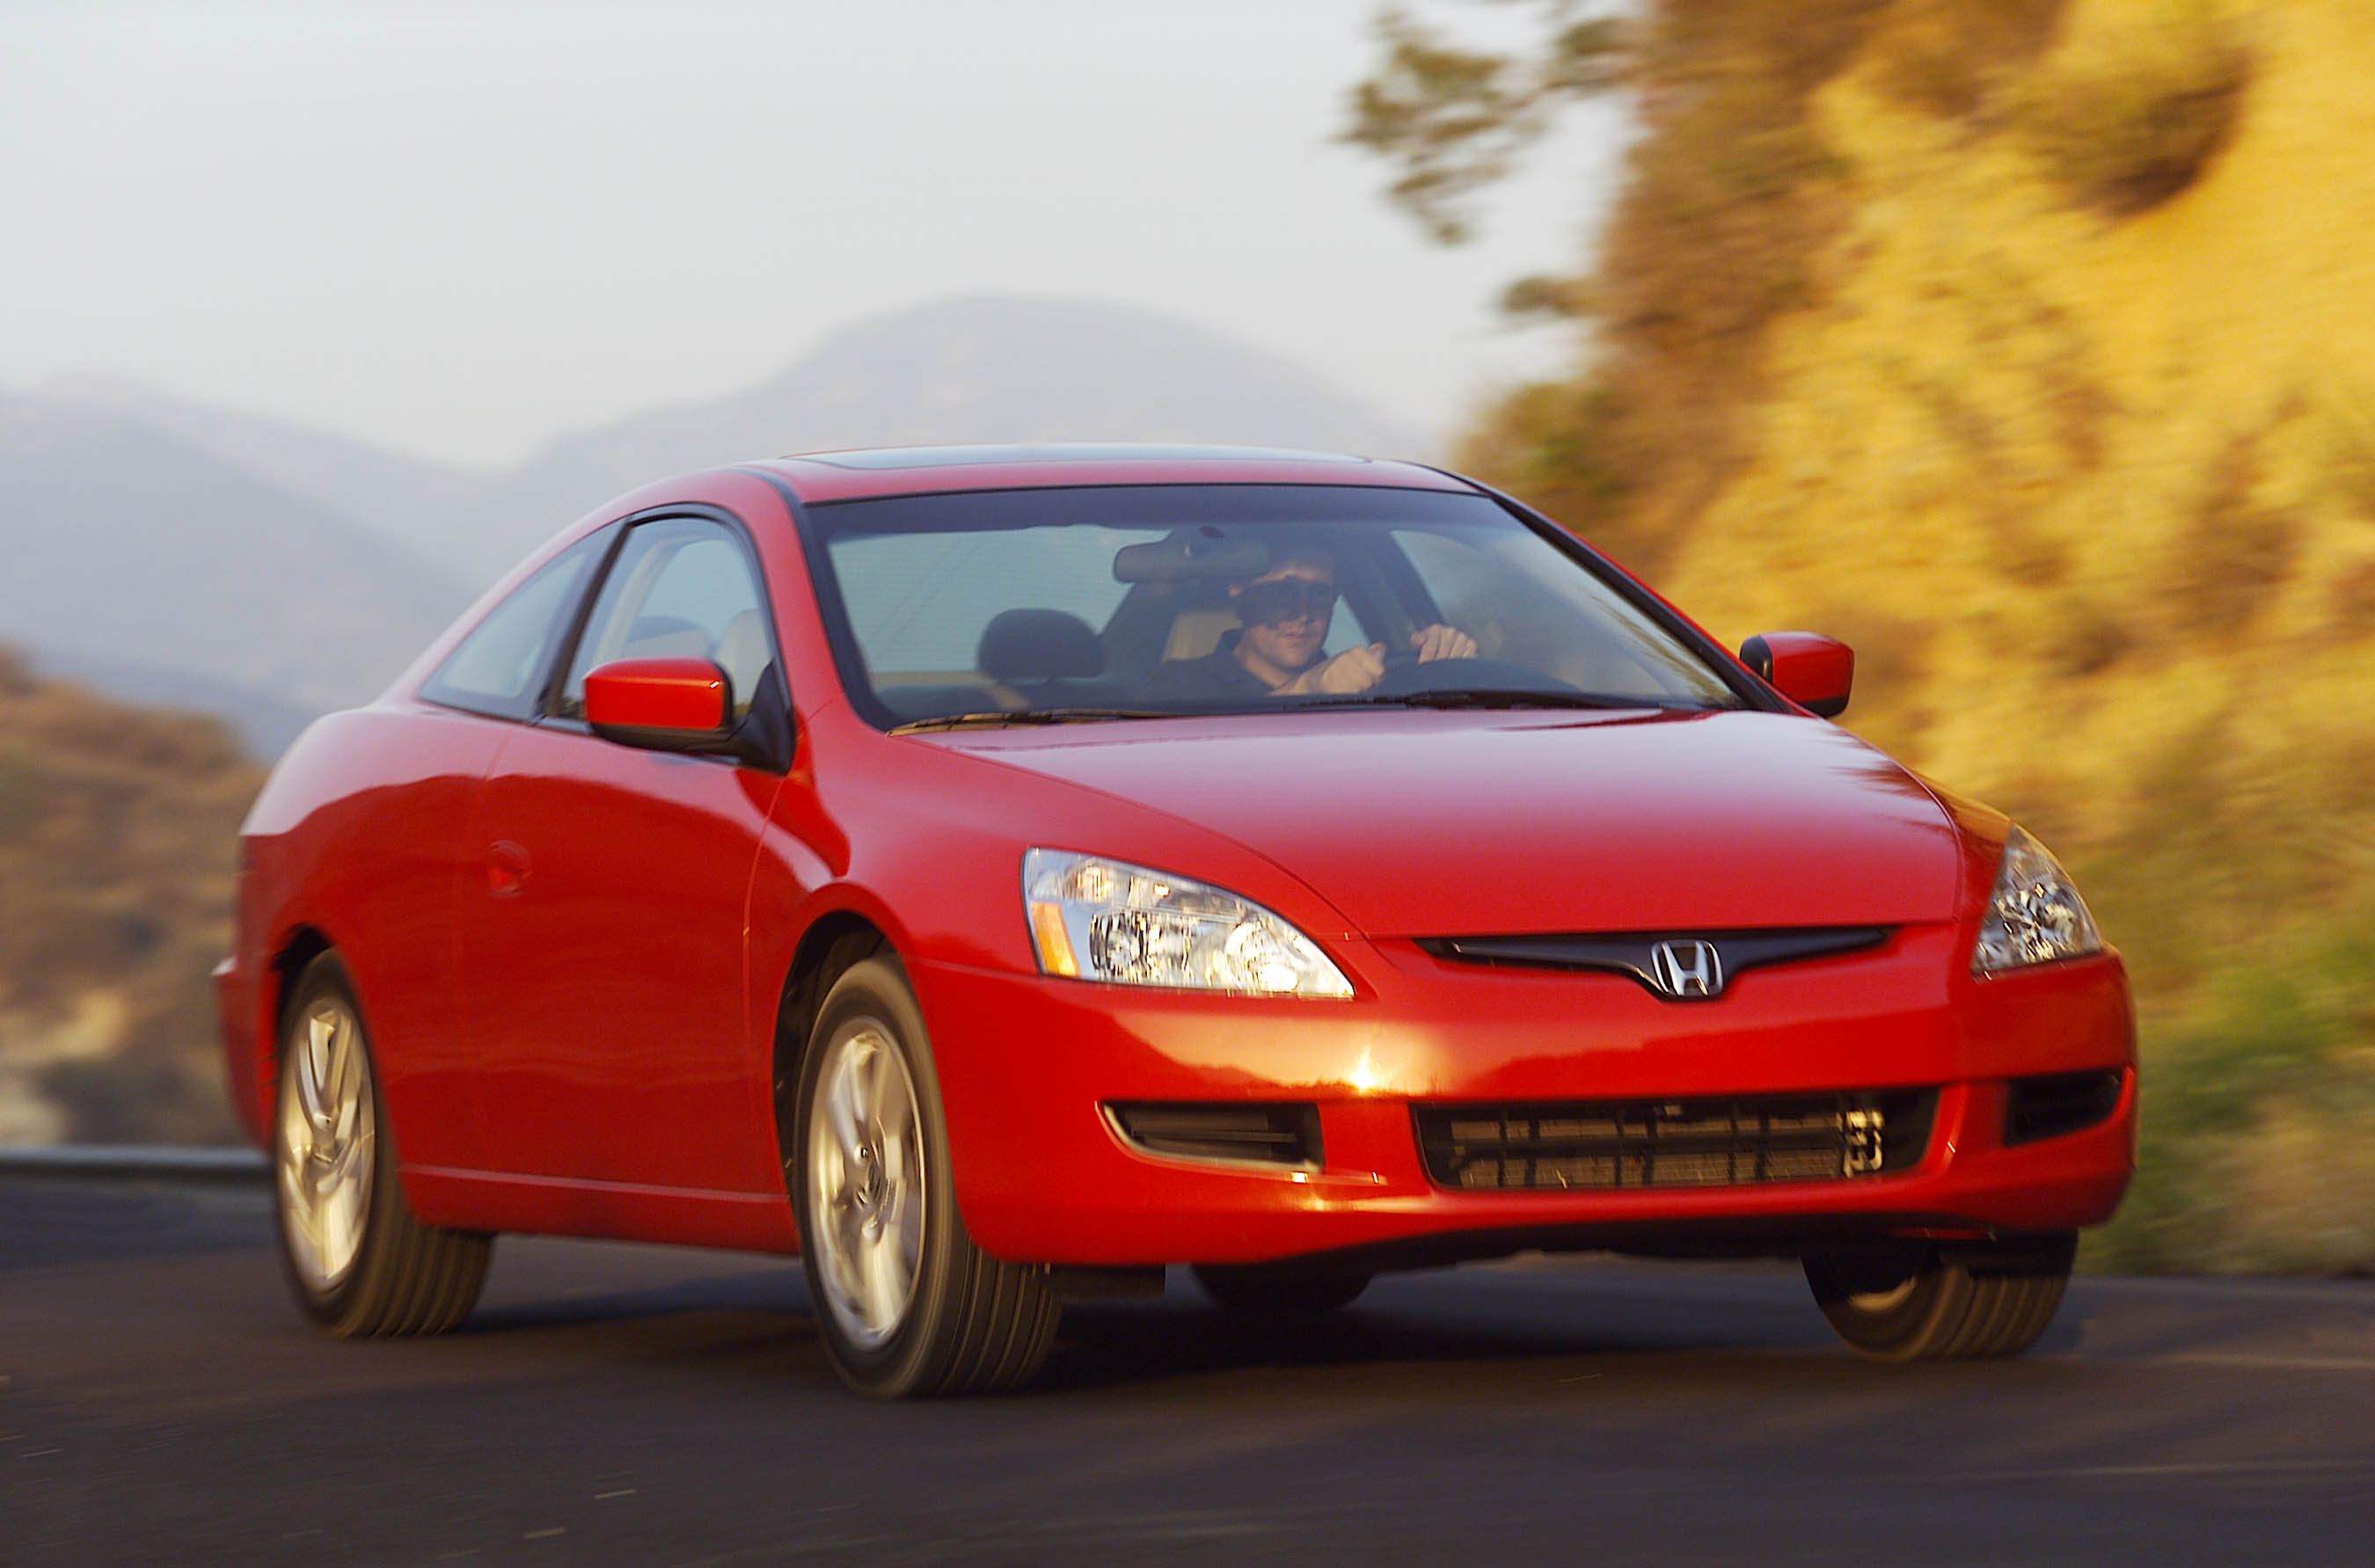 2003 Honda Accord Coupe Thumbnail Photo 73519